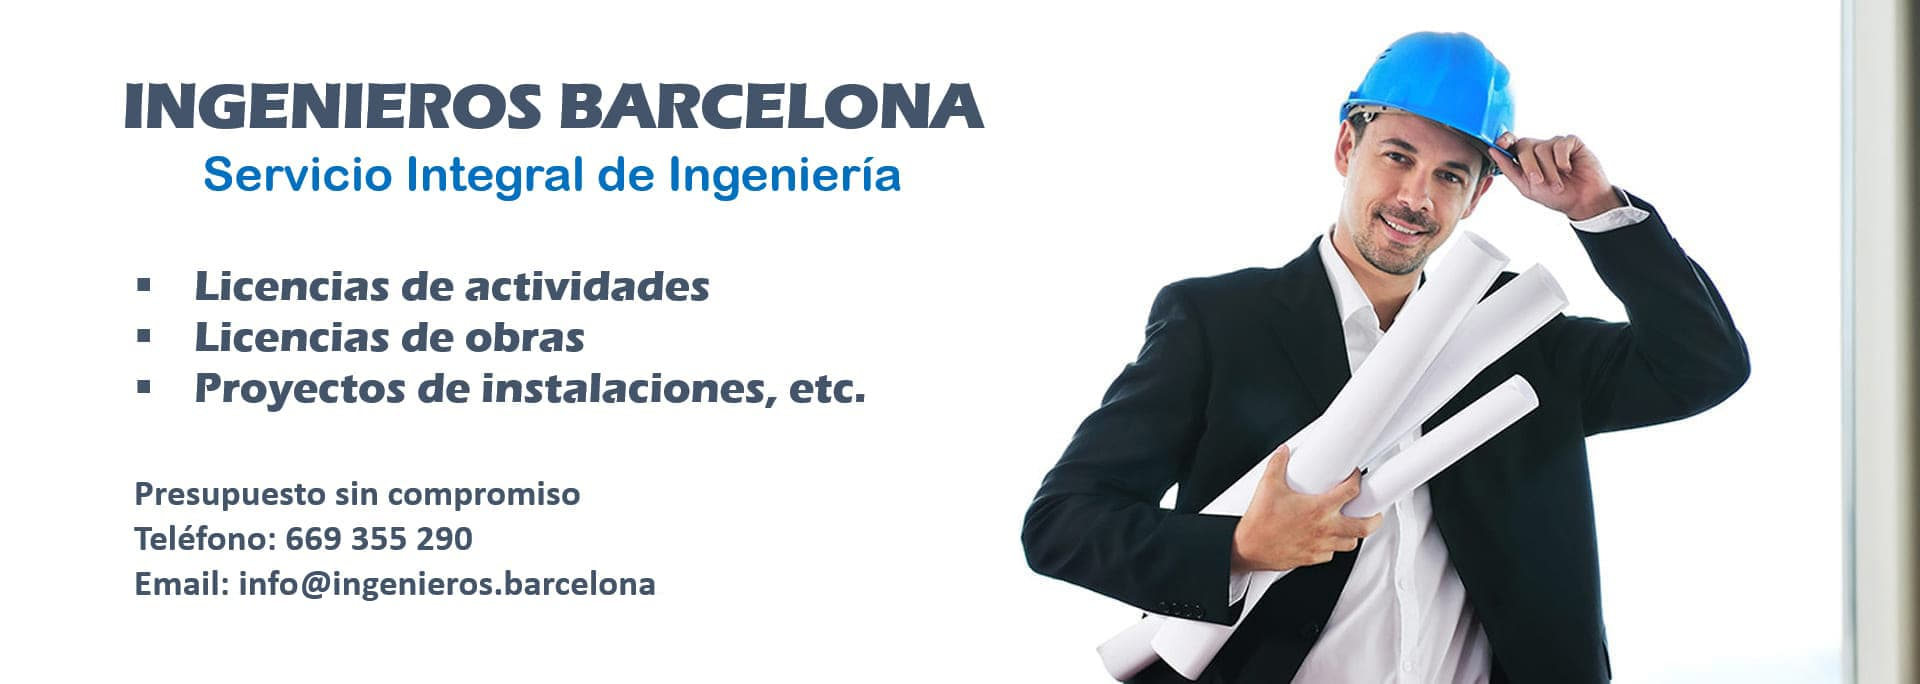 Ingenieros Barcelona home